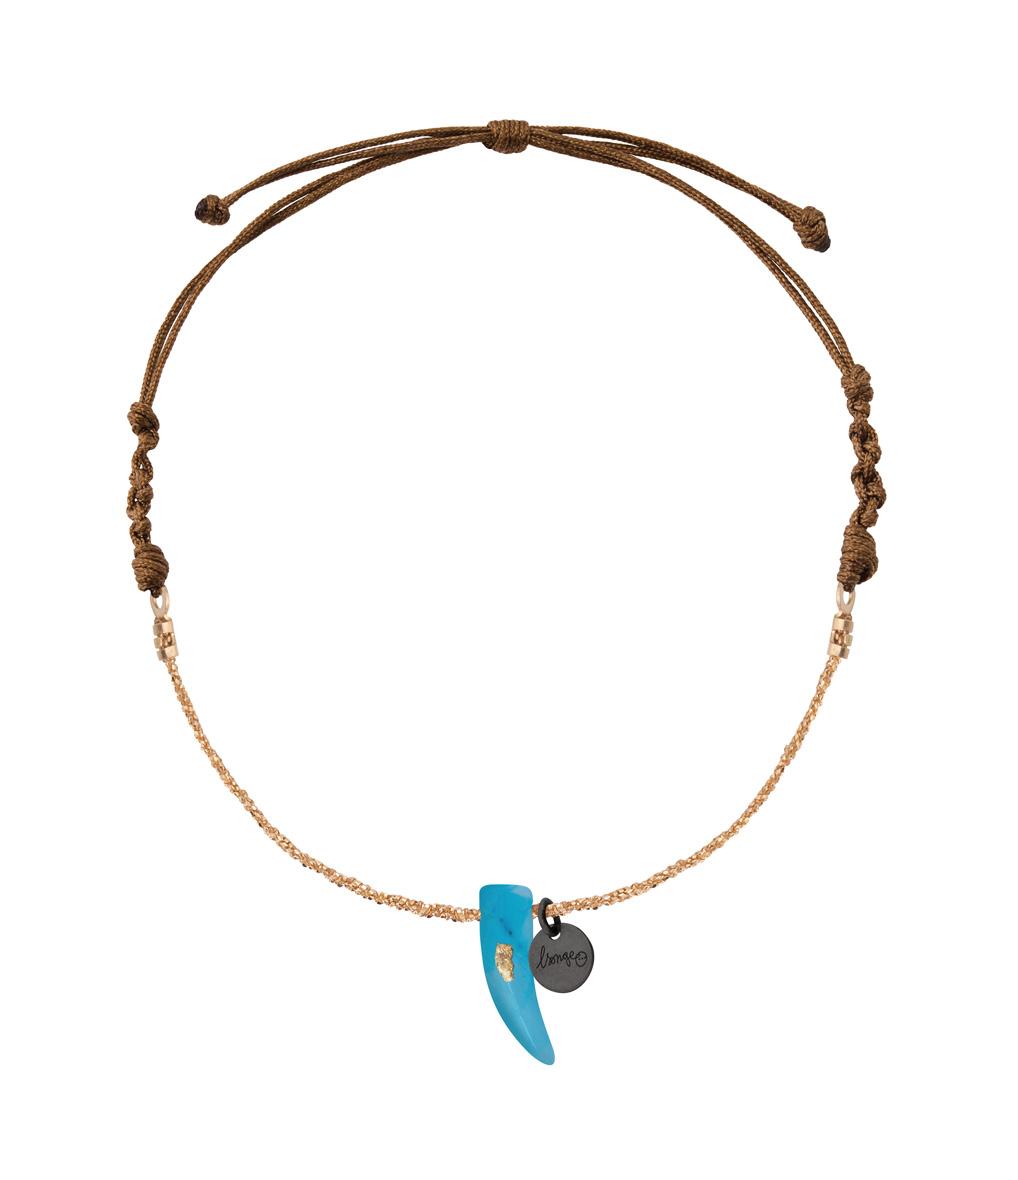 Bracelet Chaîne Cordon Corne Turquoise